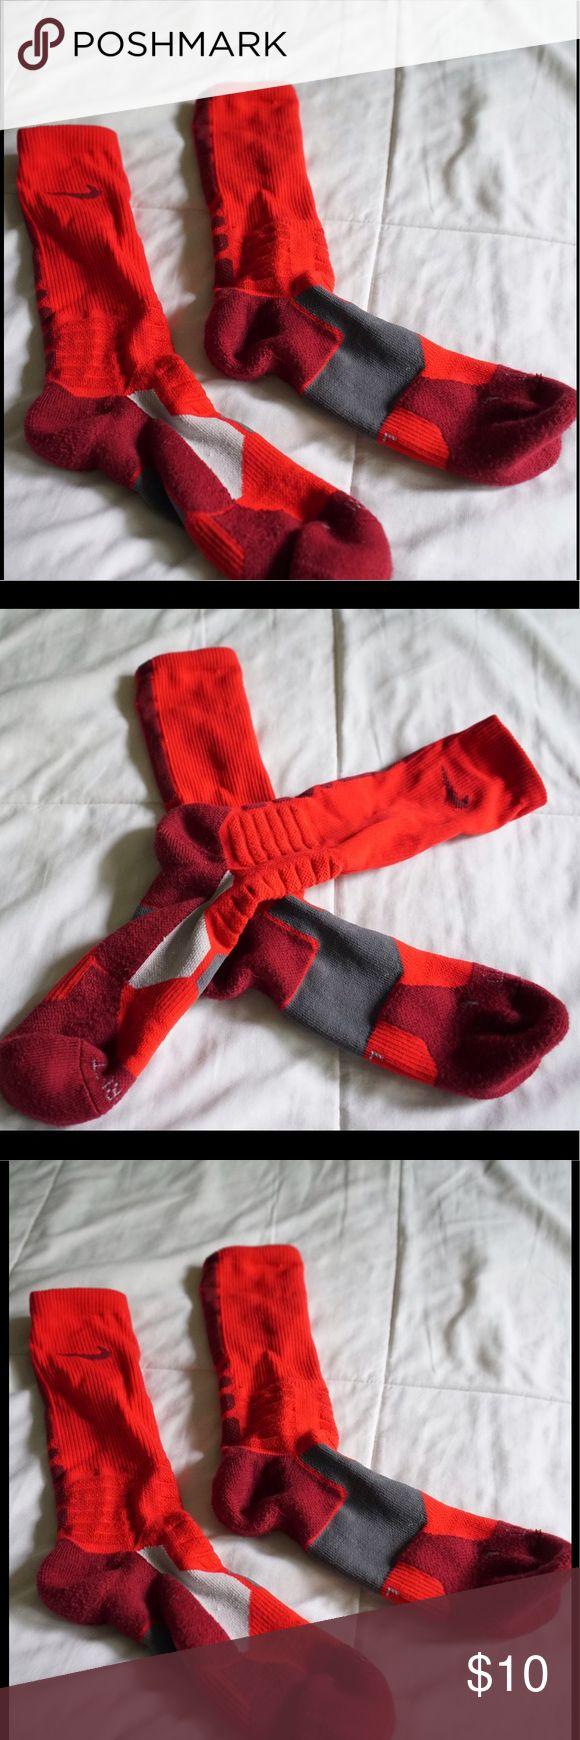 NIKE Men's Athletic Socks UNWORN Hyper elite. Long. Red/black/gray. Dri-fit. Super thick. Heavy duty. Nike Underwear & Socks Athletic Socks